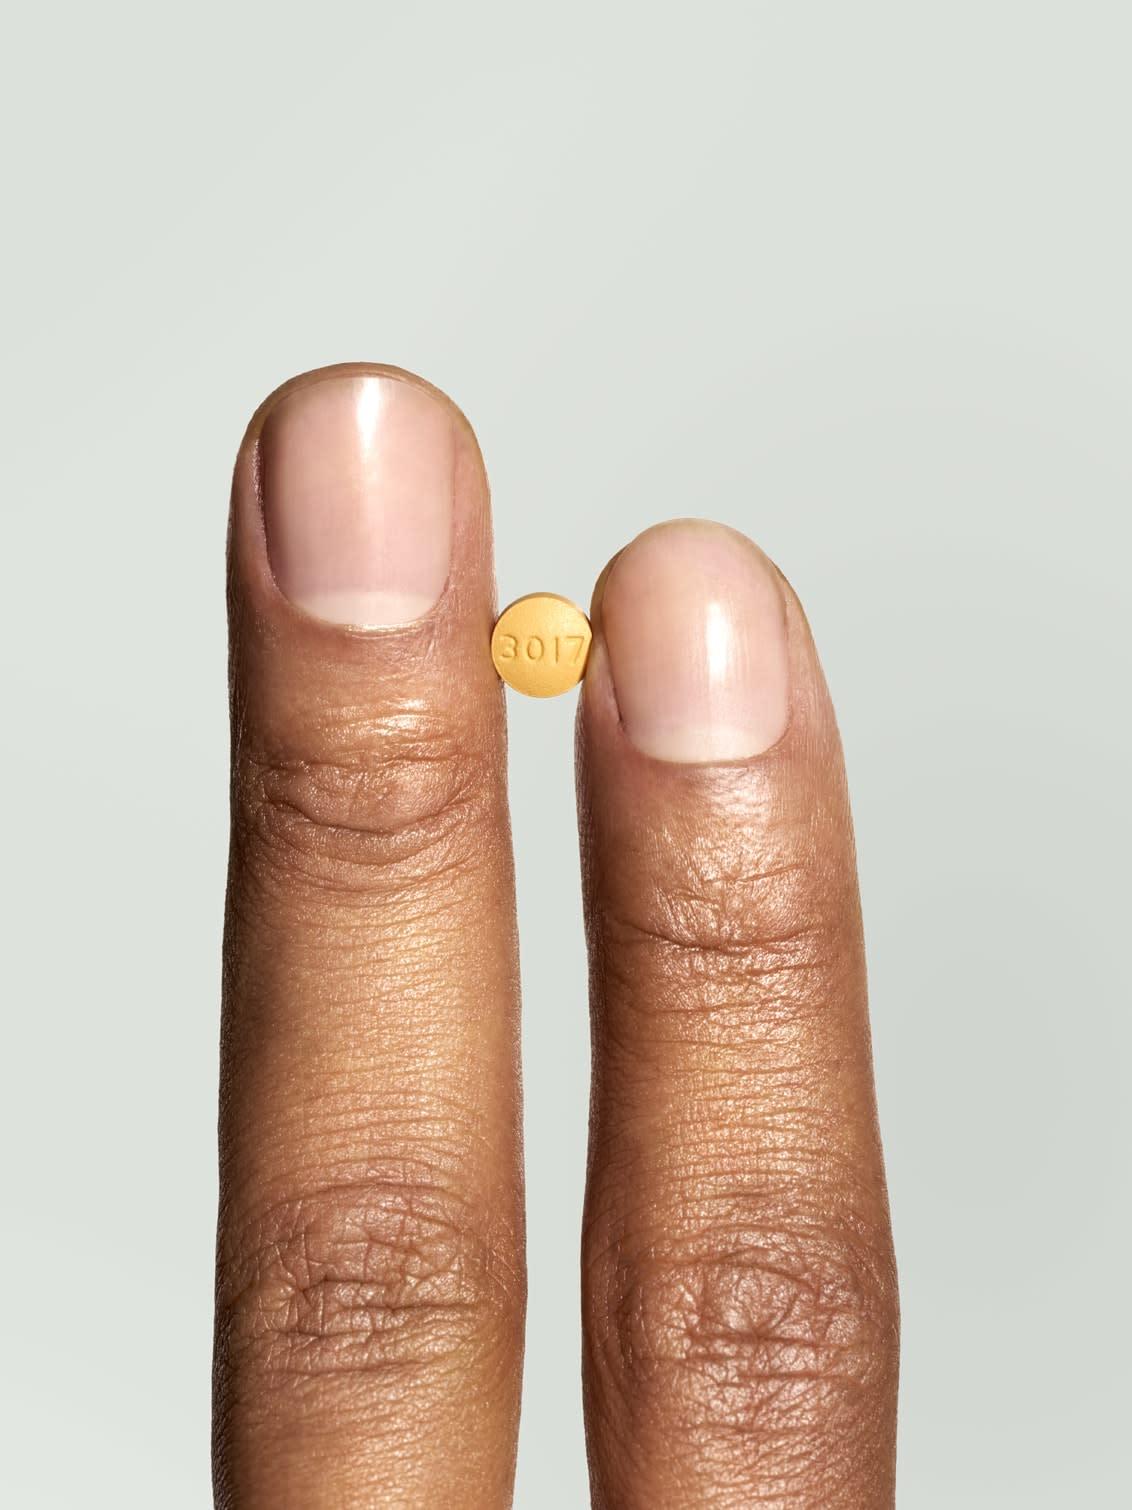 A hand holding a Hims Tadalafil pill